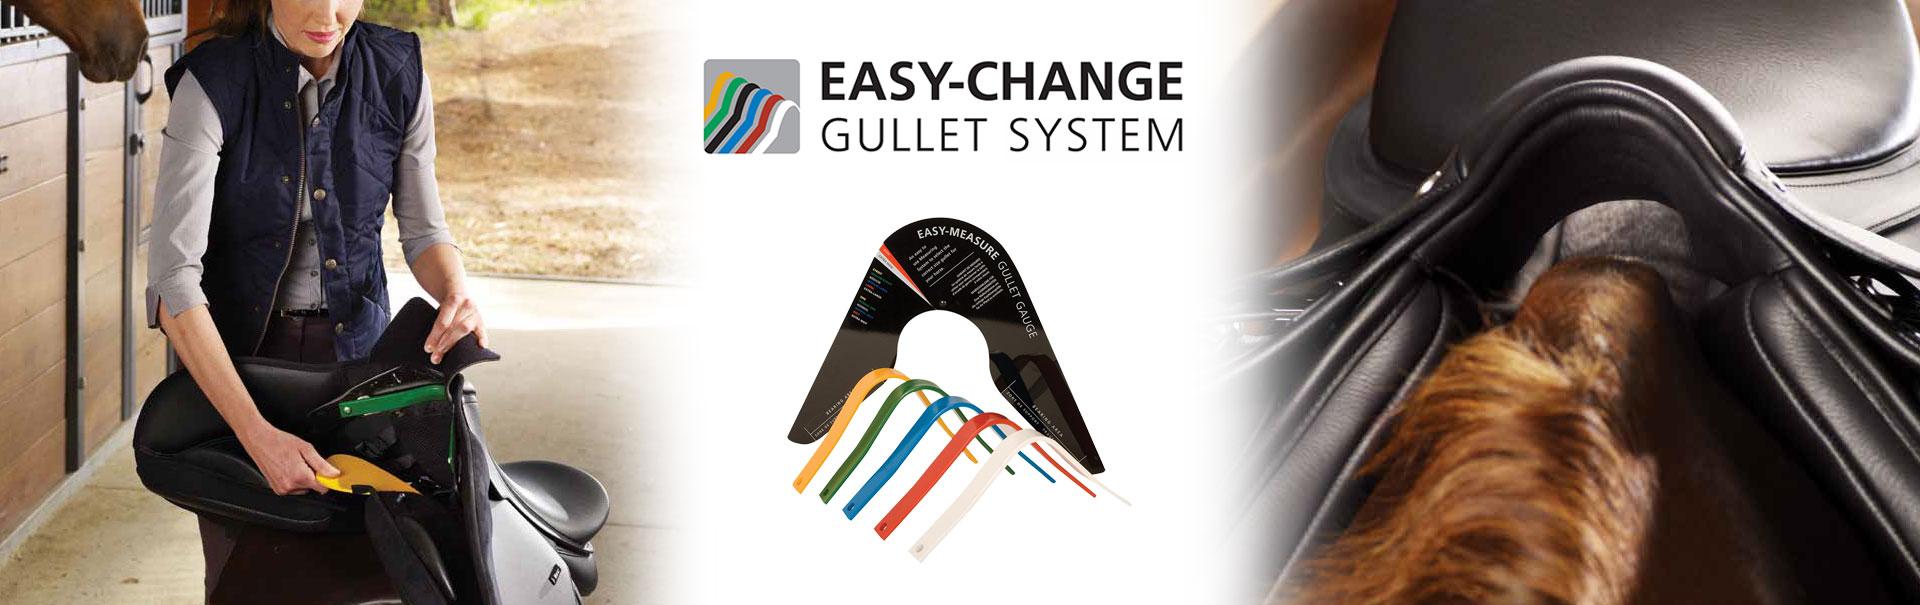 Easy-Change Gullet System